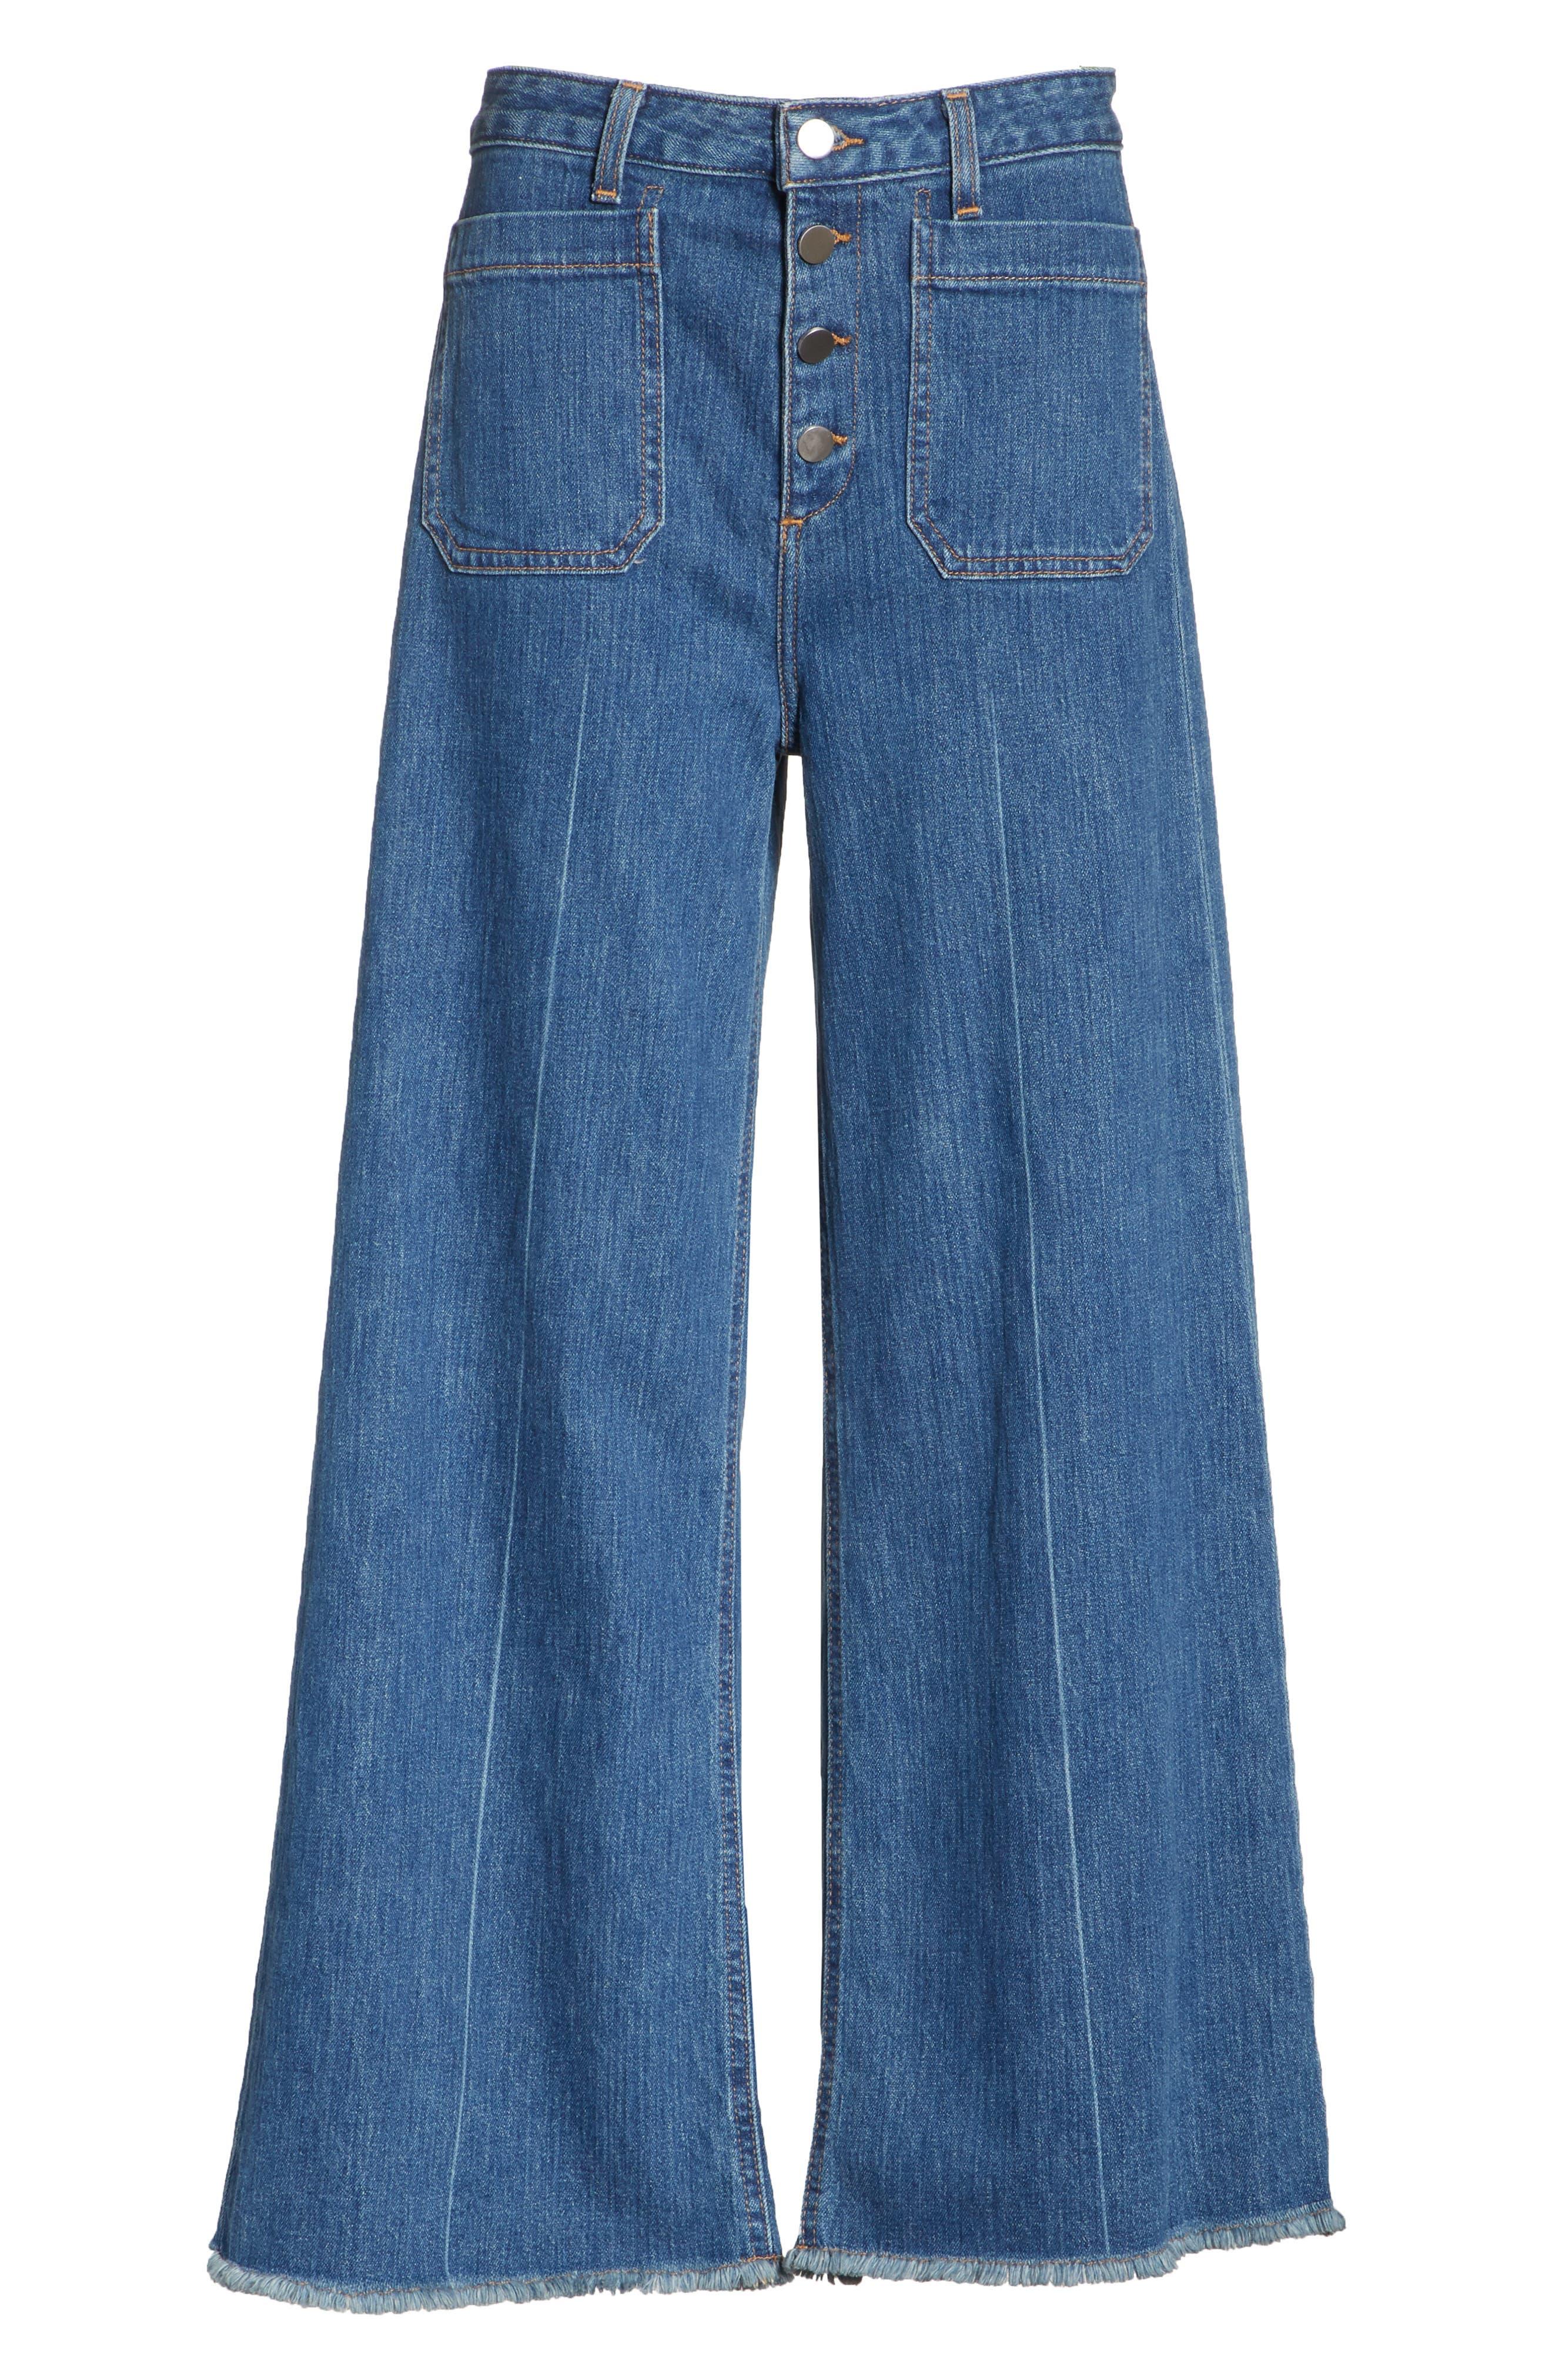 Carmine Wide Leg Jeans,                             Alternate thumbnail 6, color,                             Medium Denim